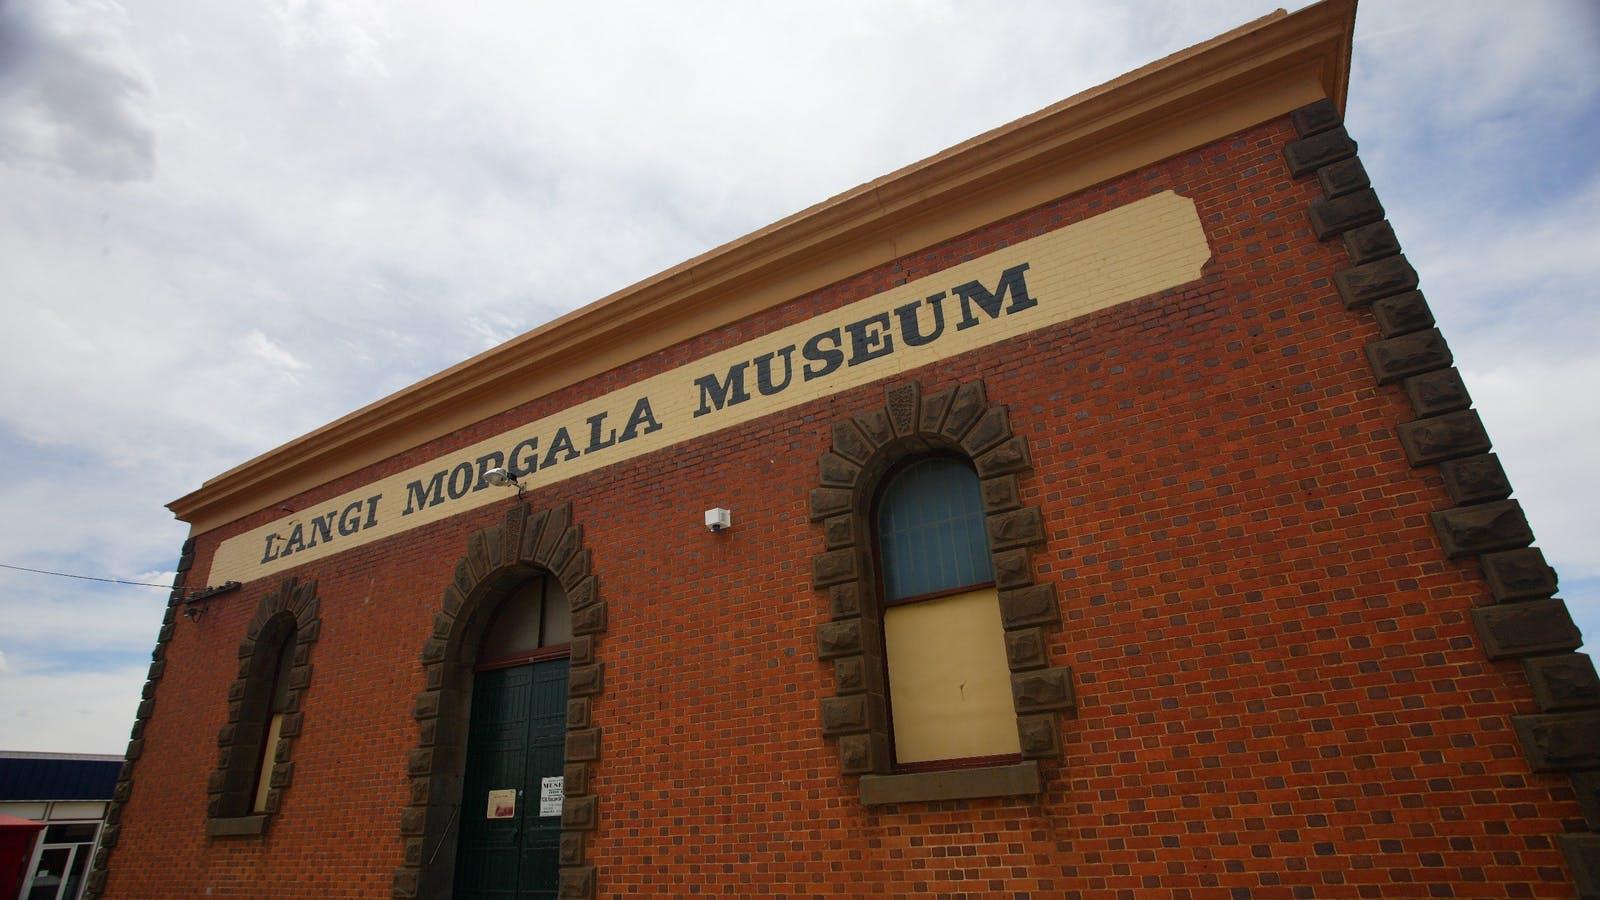 Langi Morgala Museum,Ararat